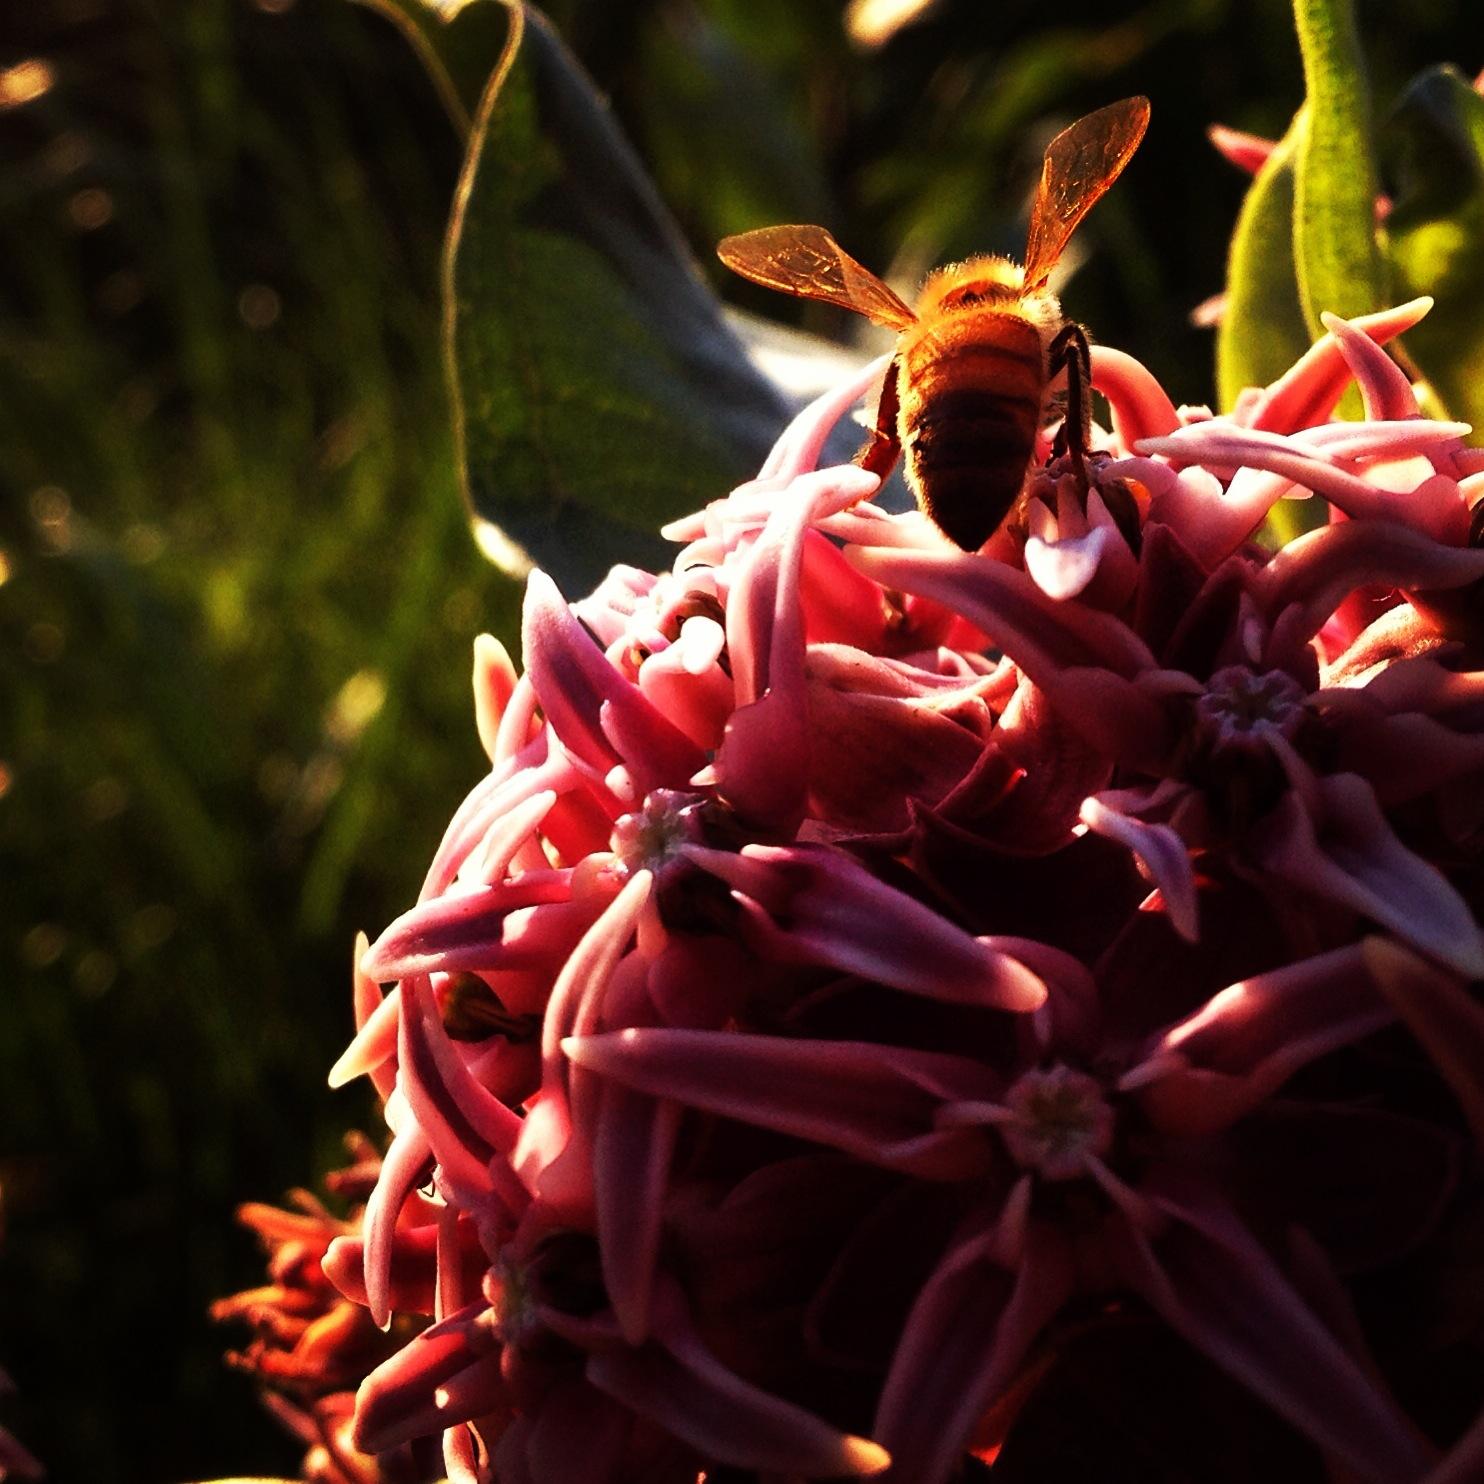 Bee & flower.